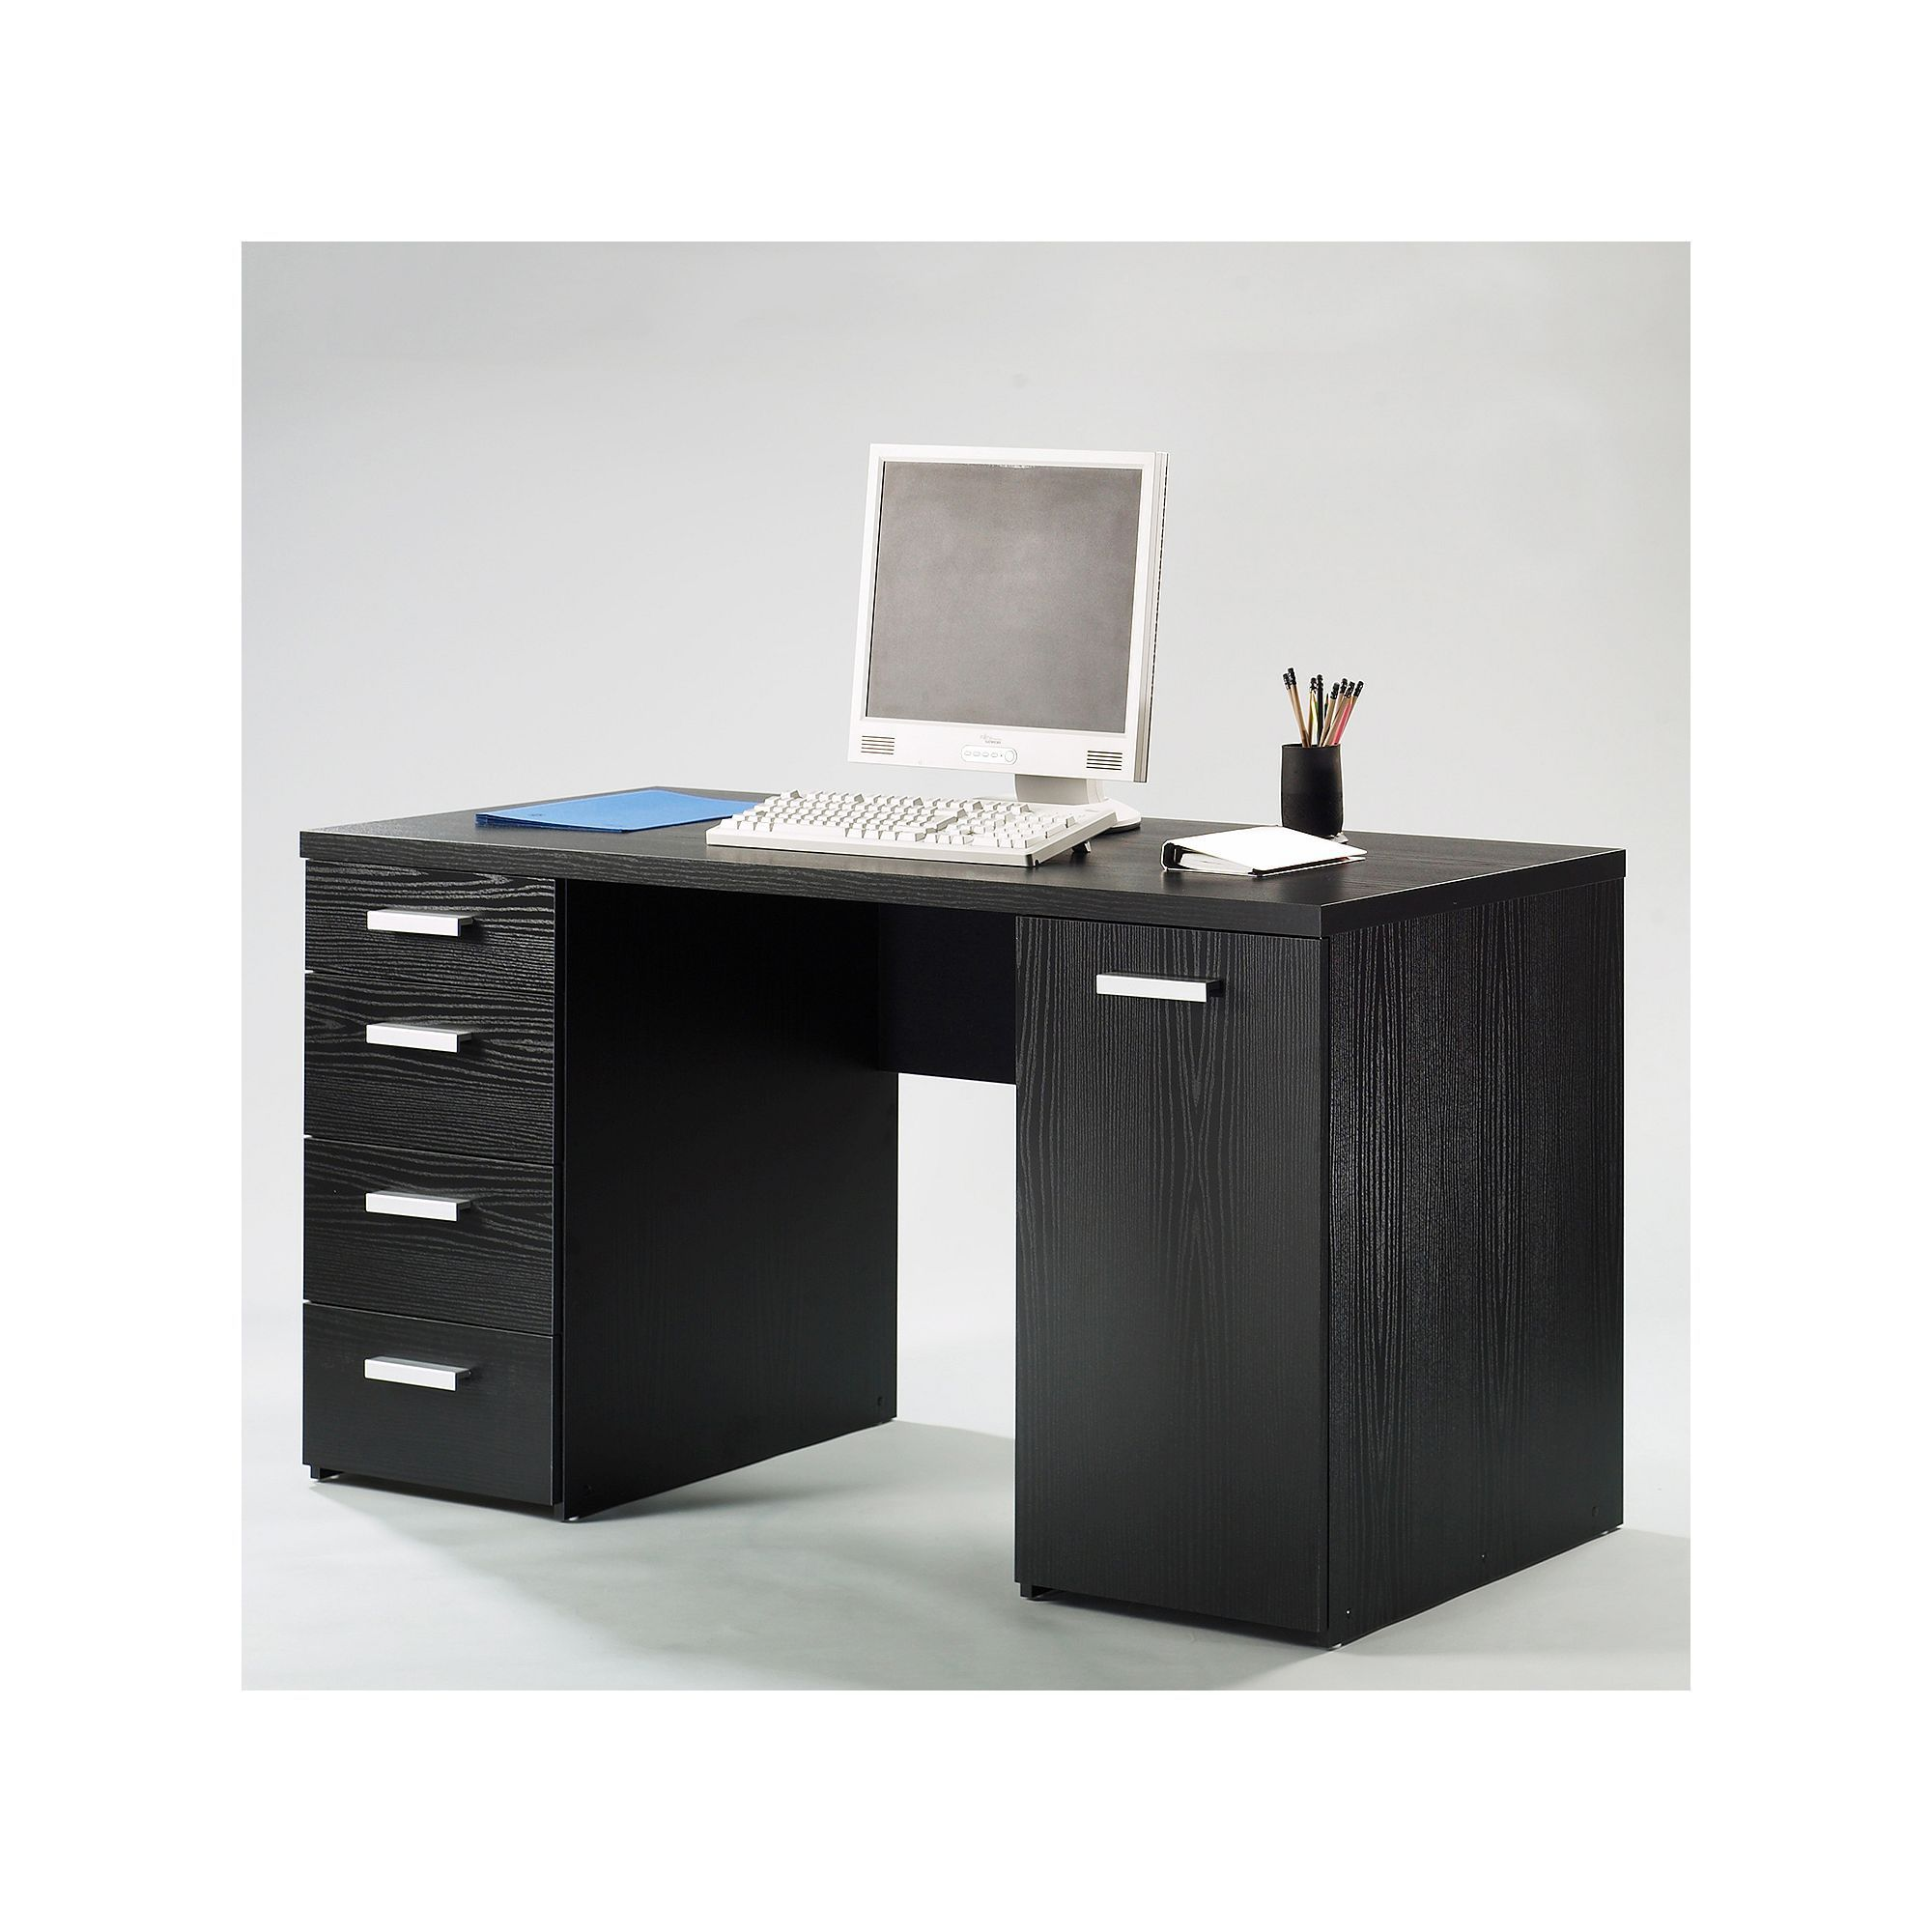 Whitman Plus Classic Desk Desk, Global office furniture